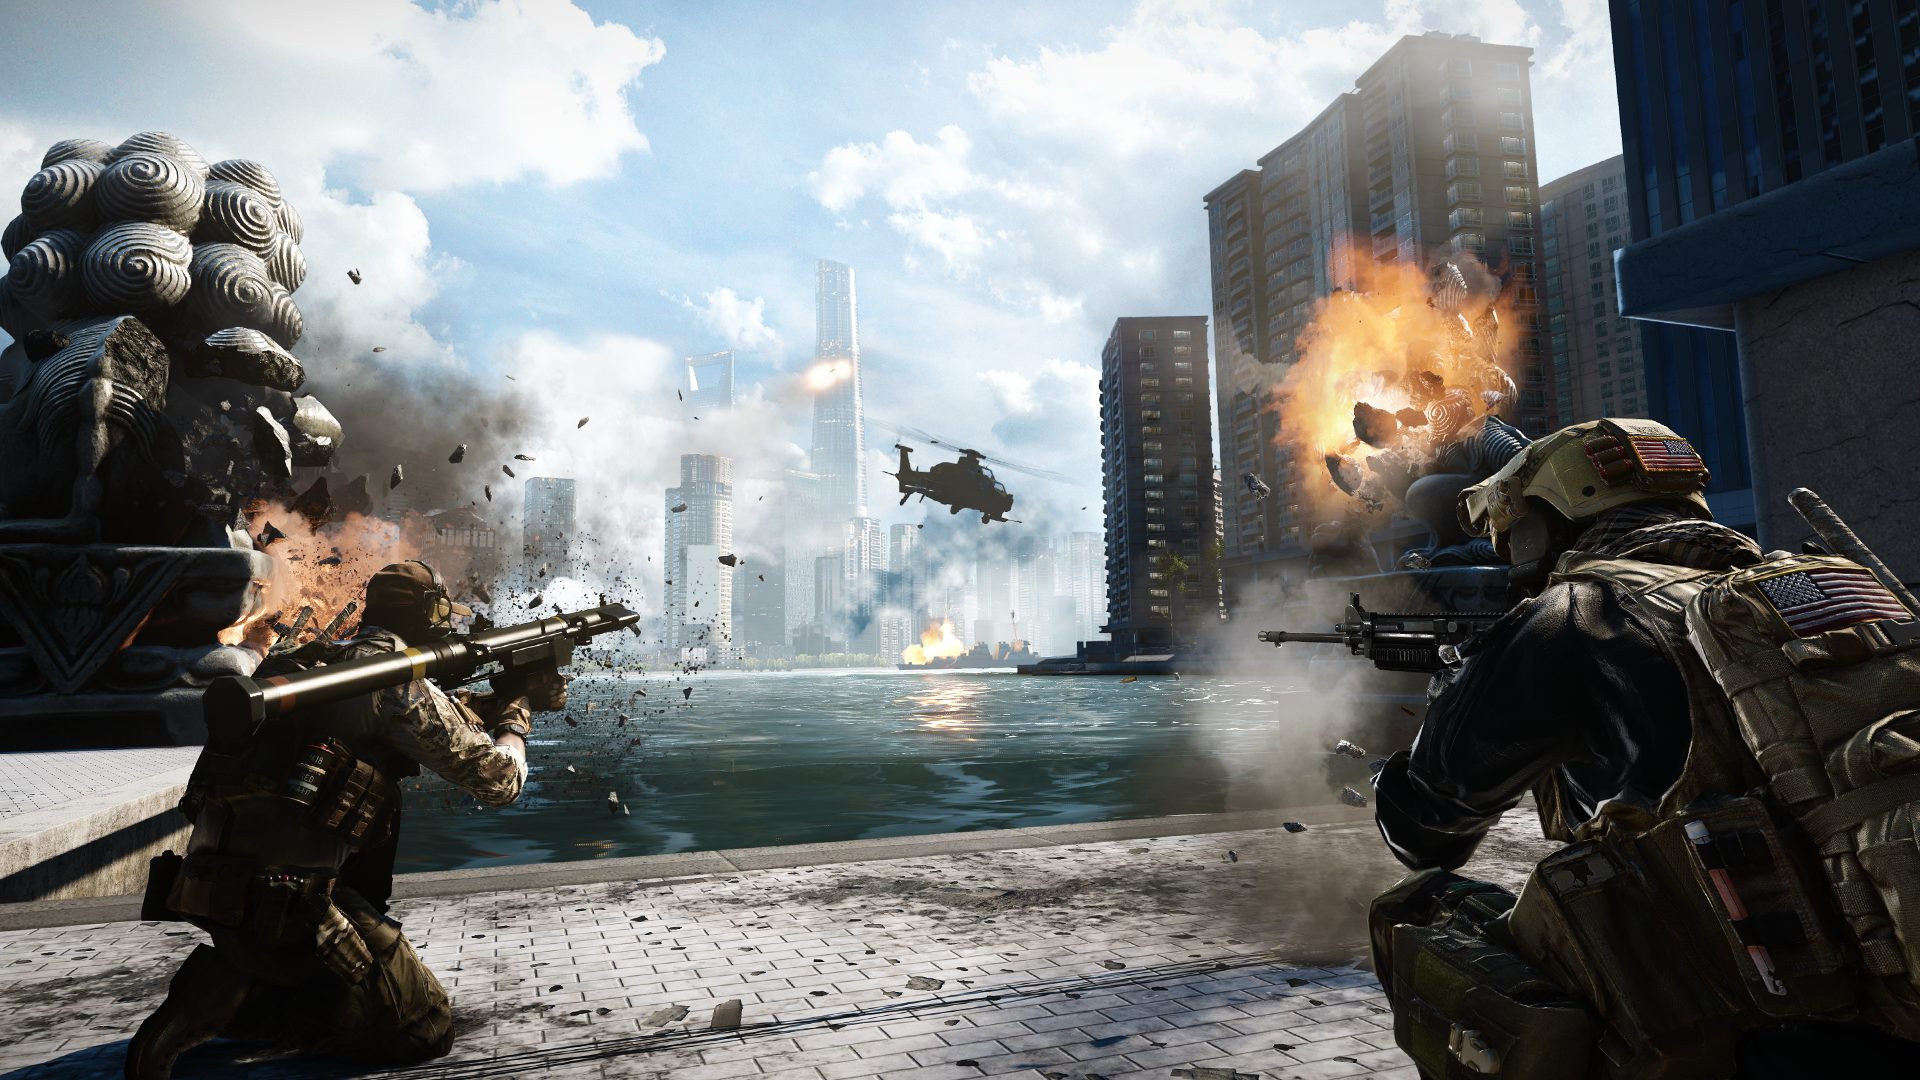 Battlefield 4 Backgrounds on Wallpapers Vista